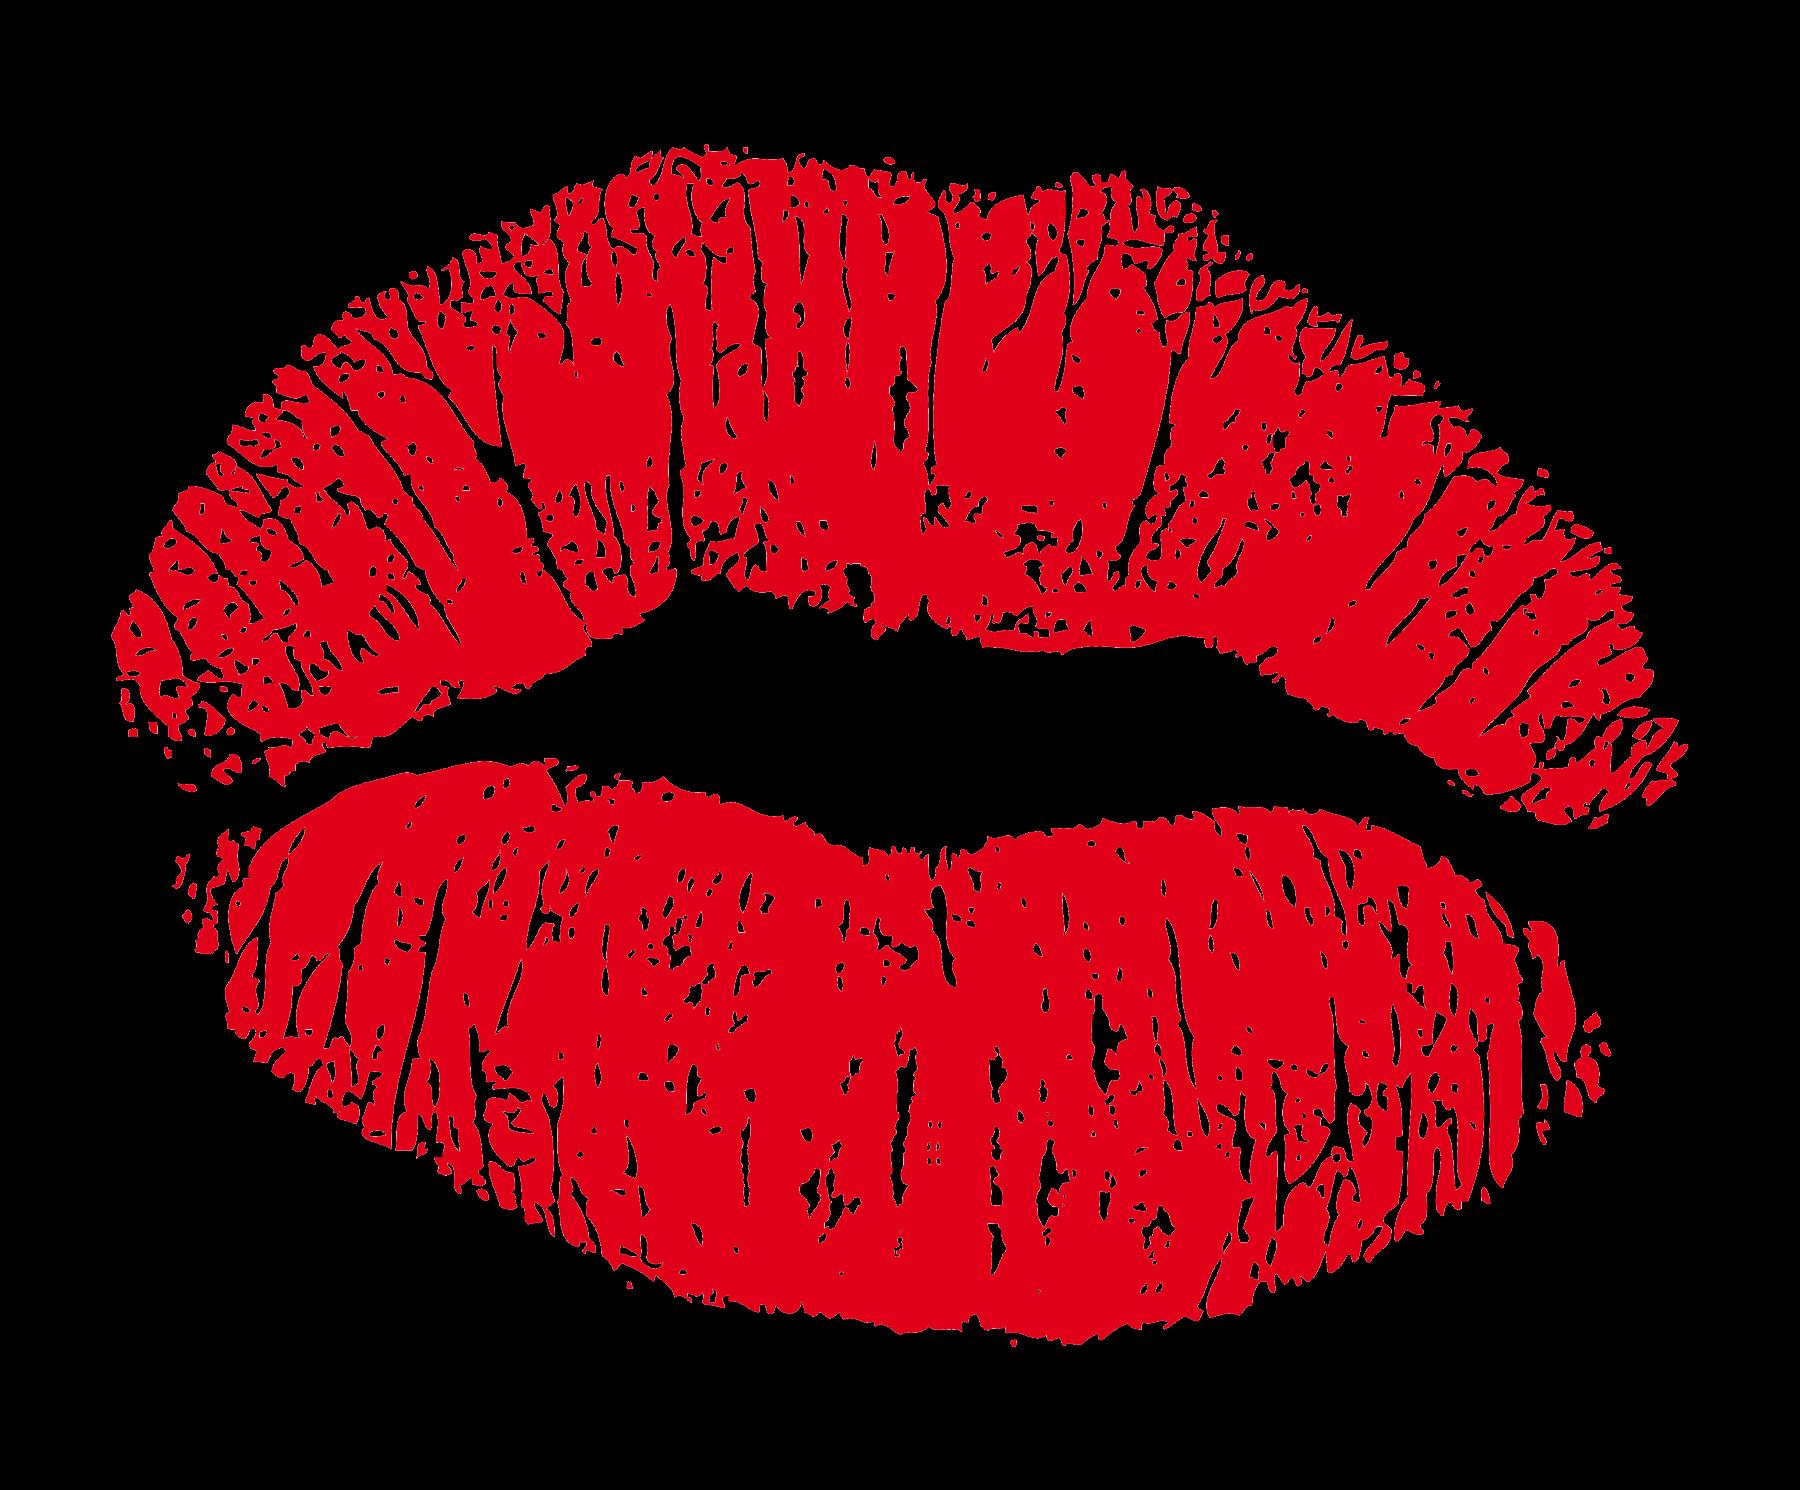 /var/www/html/wp-content/uploads/2018/10/Kiss_PNG_Image_40683-1